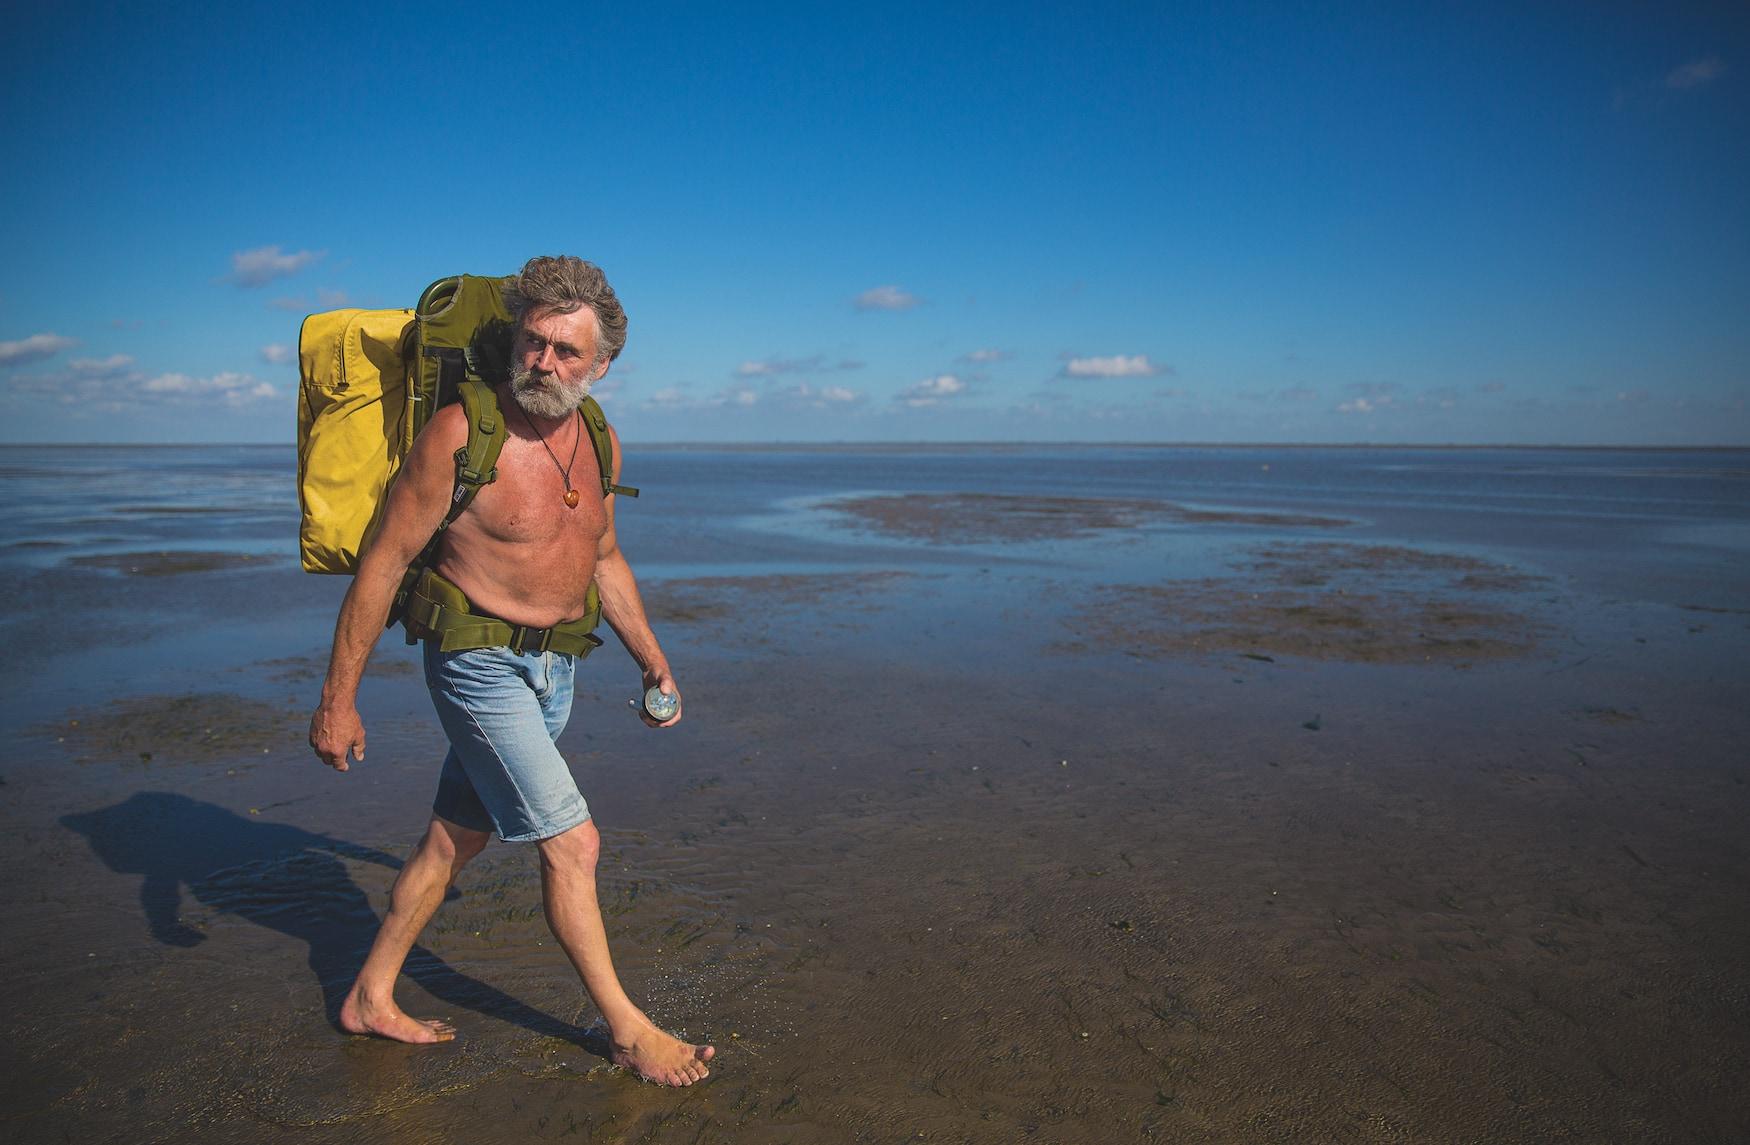 Watt-Postbote Knud Knudsen spaziert oberkörperfrei durchs Watt